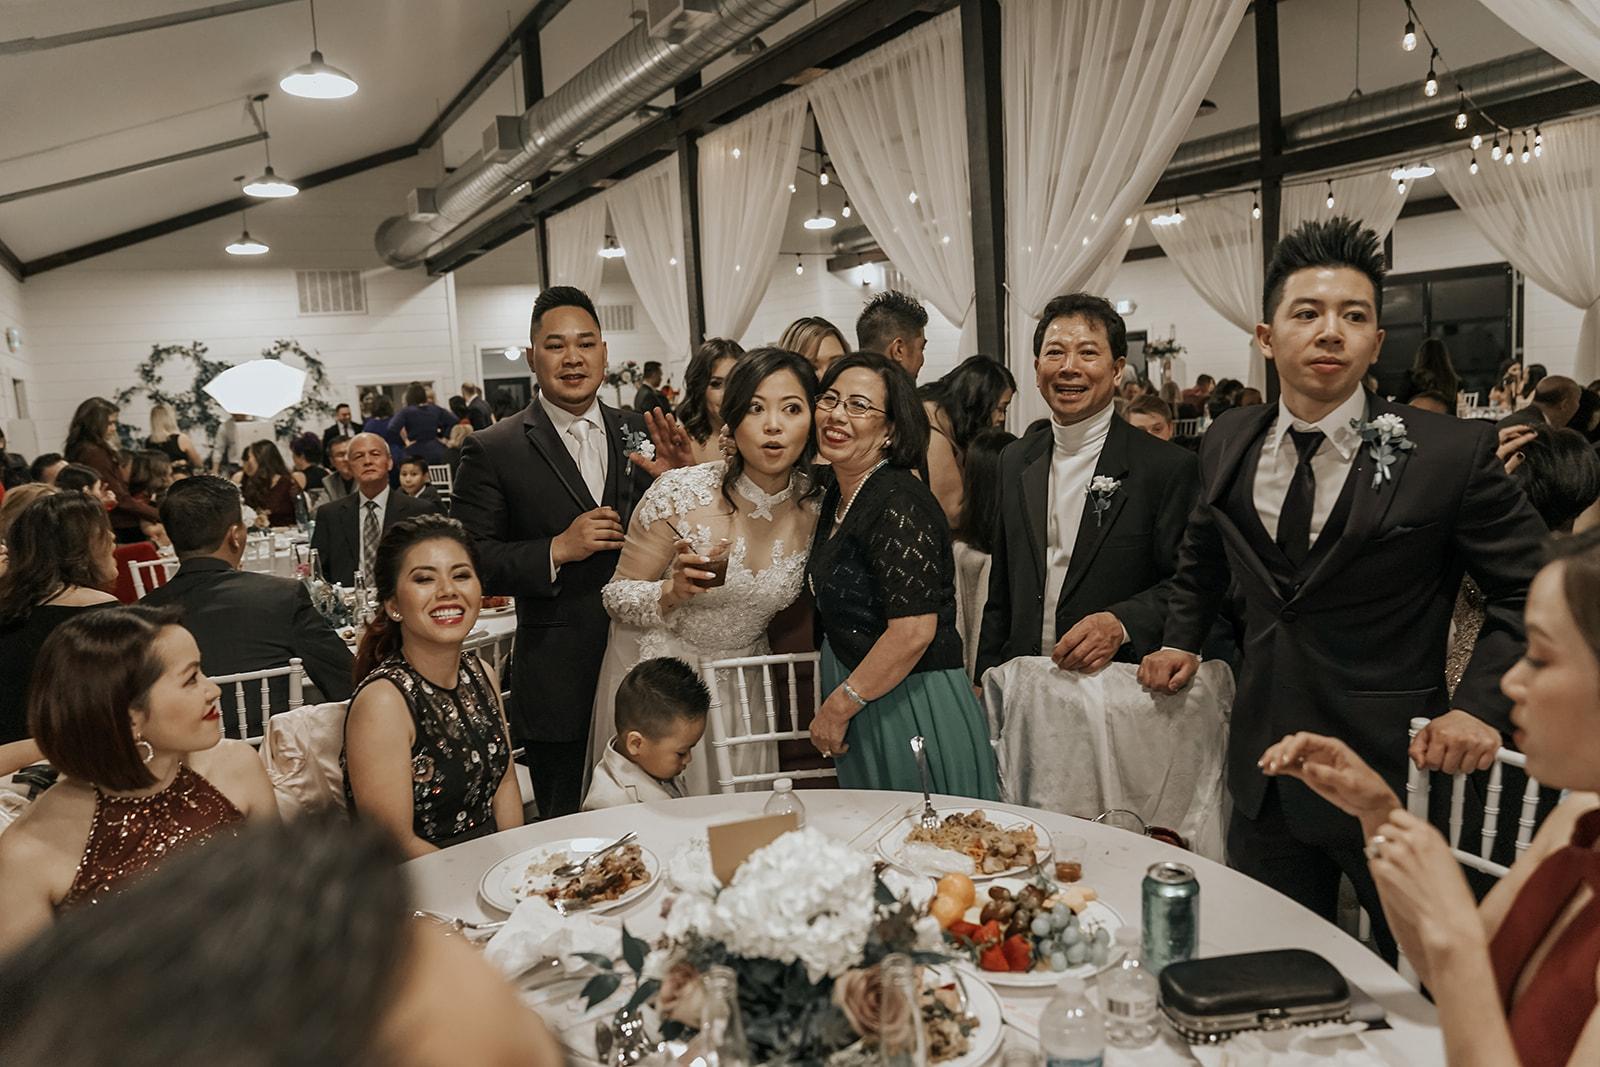 Bixby Tulsa White Barn Wedding Venues 20a.jpg